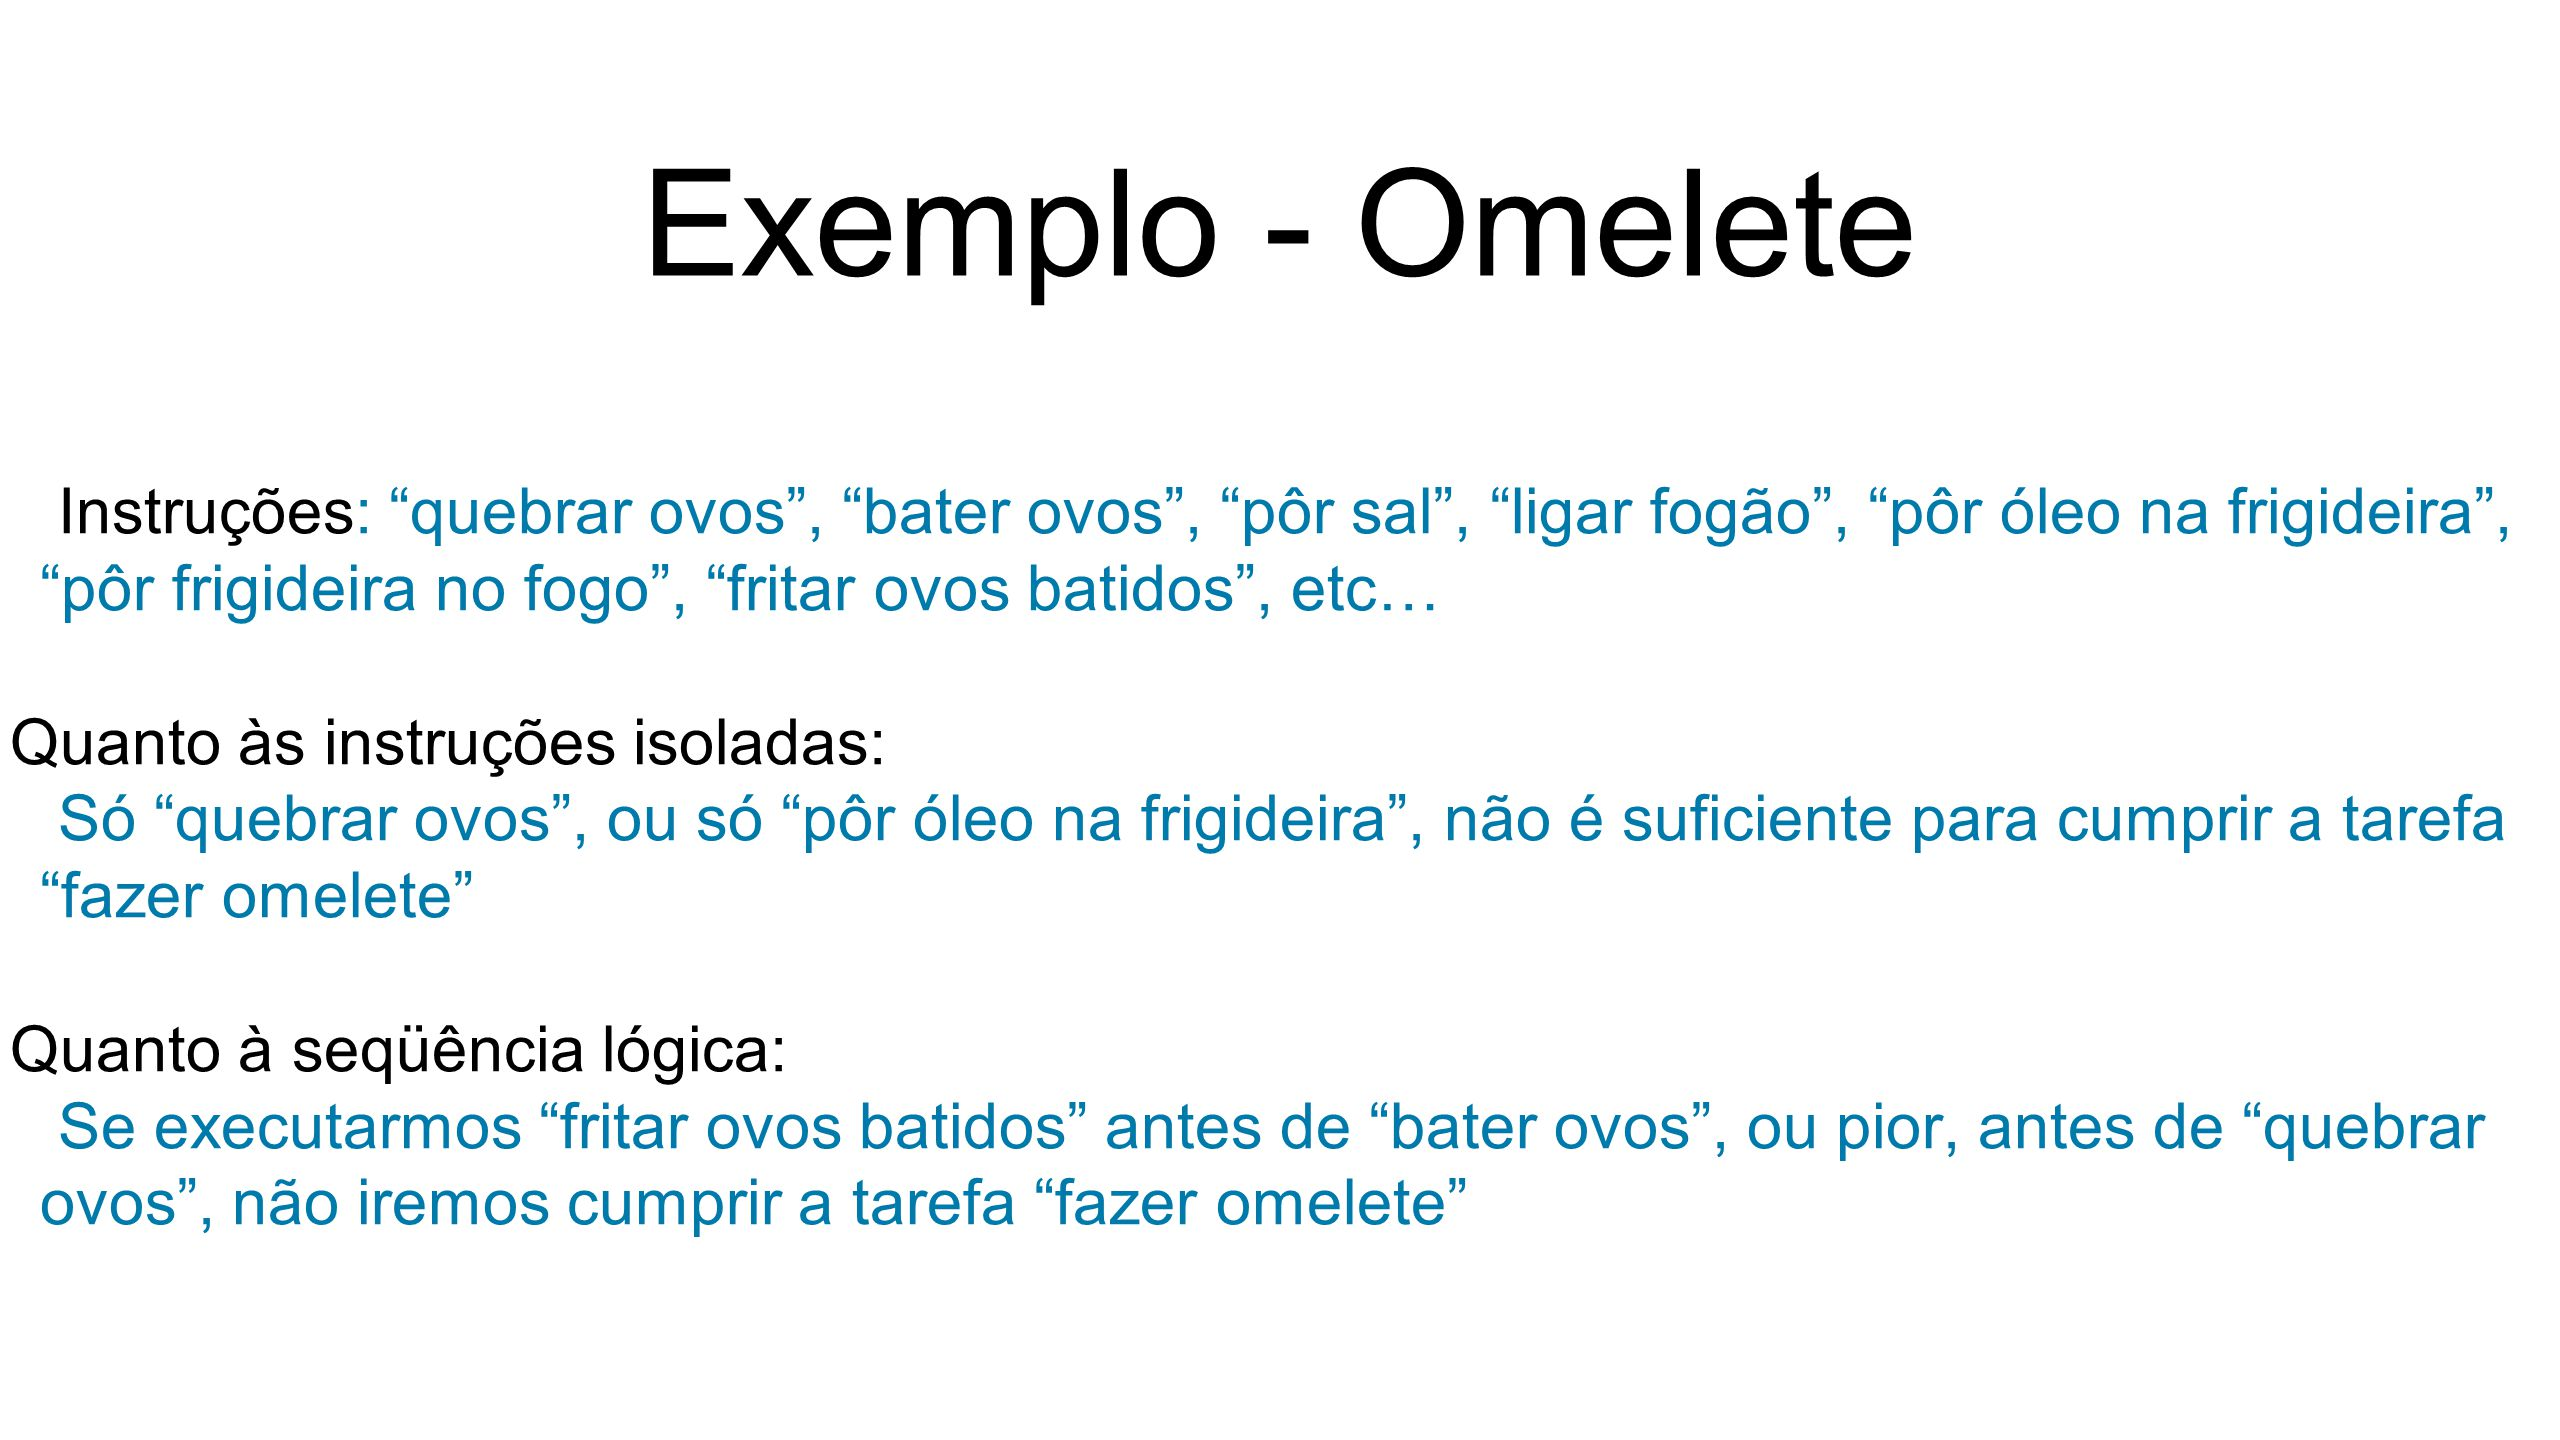 Exemplo - Omelete